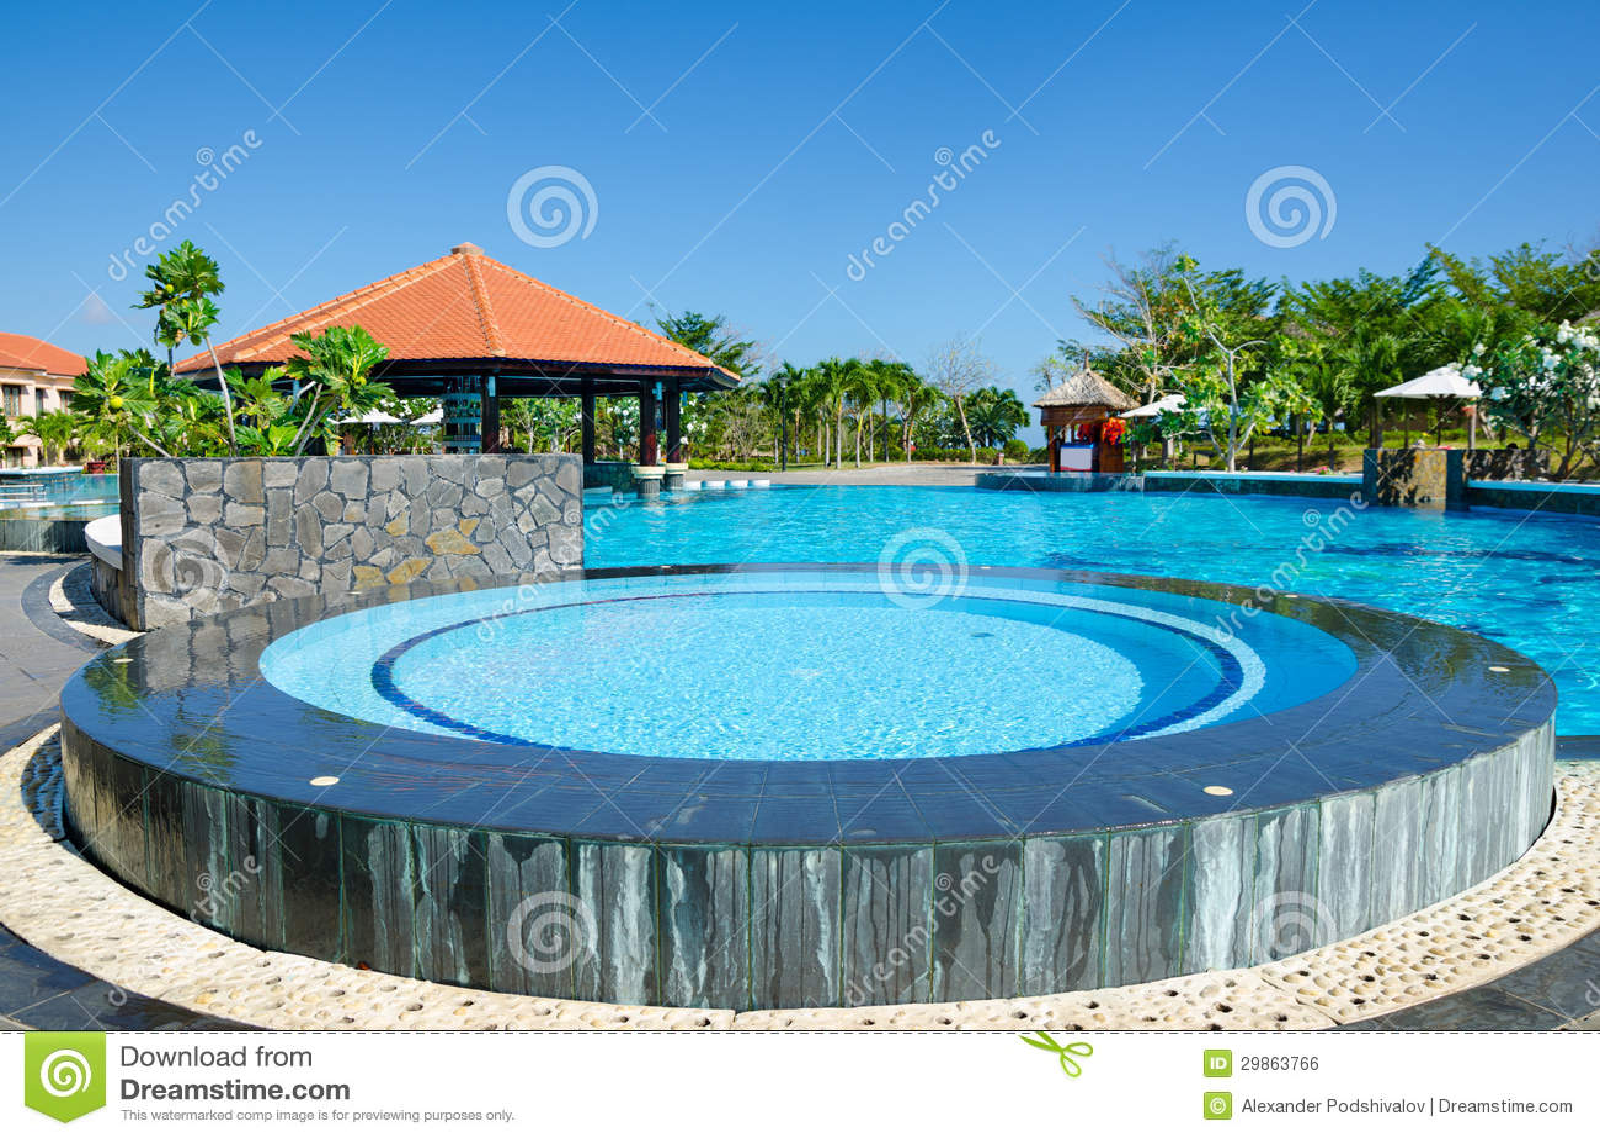 Swimming pool near hotel royalty free stock image image 29863766 Where can i buy a swimming pool near me